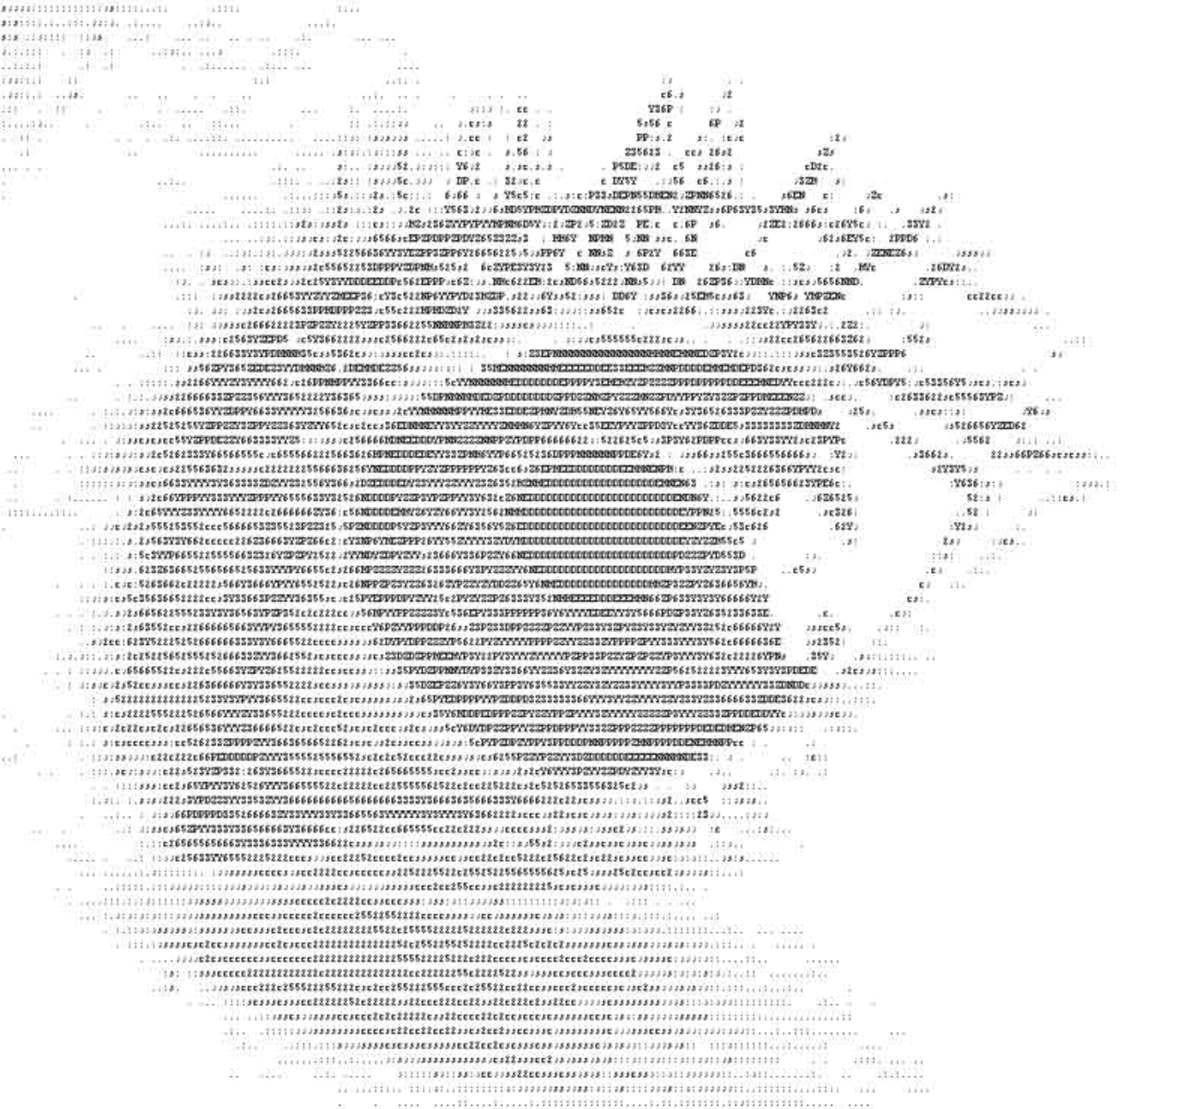 Single Line Ascii Art : Ascii art by glen